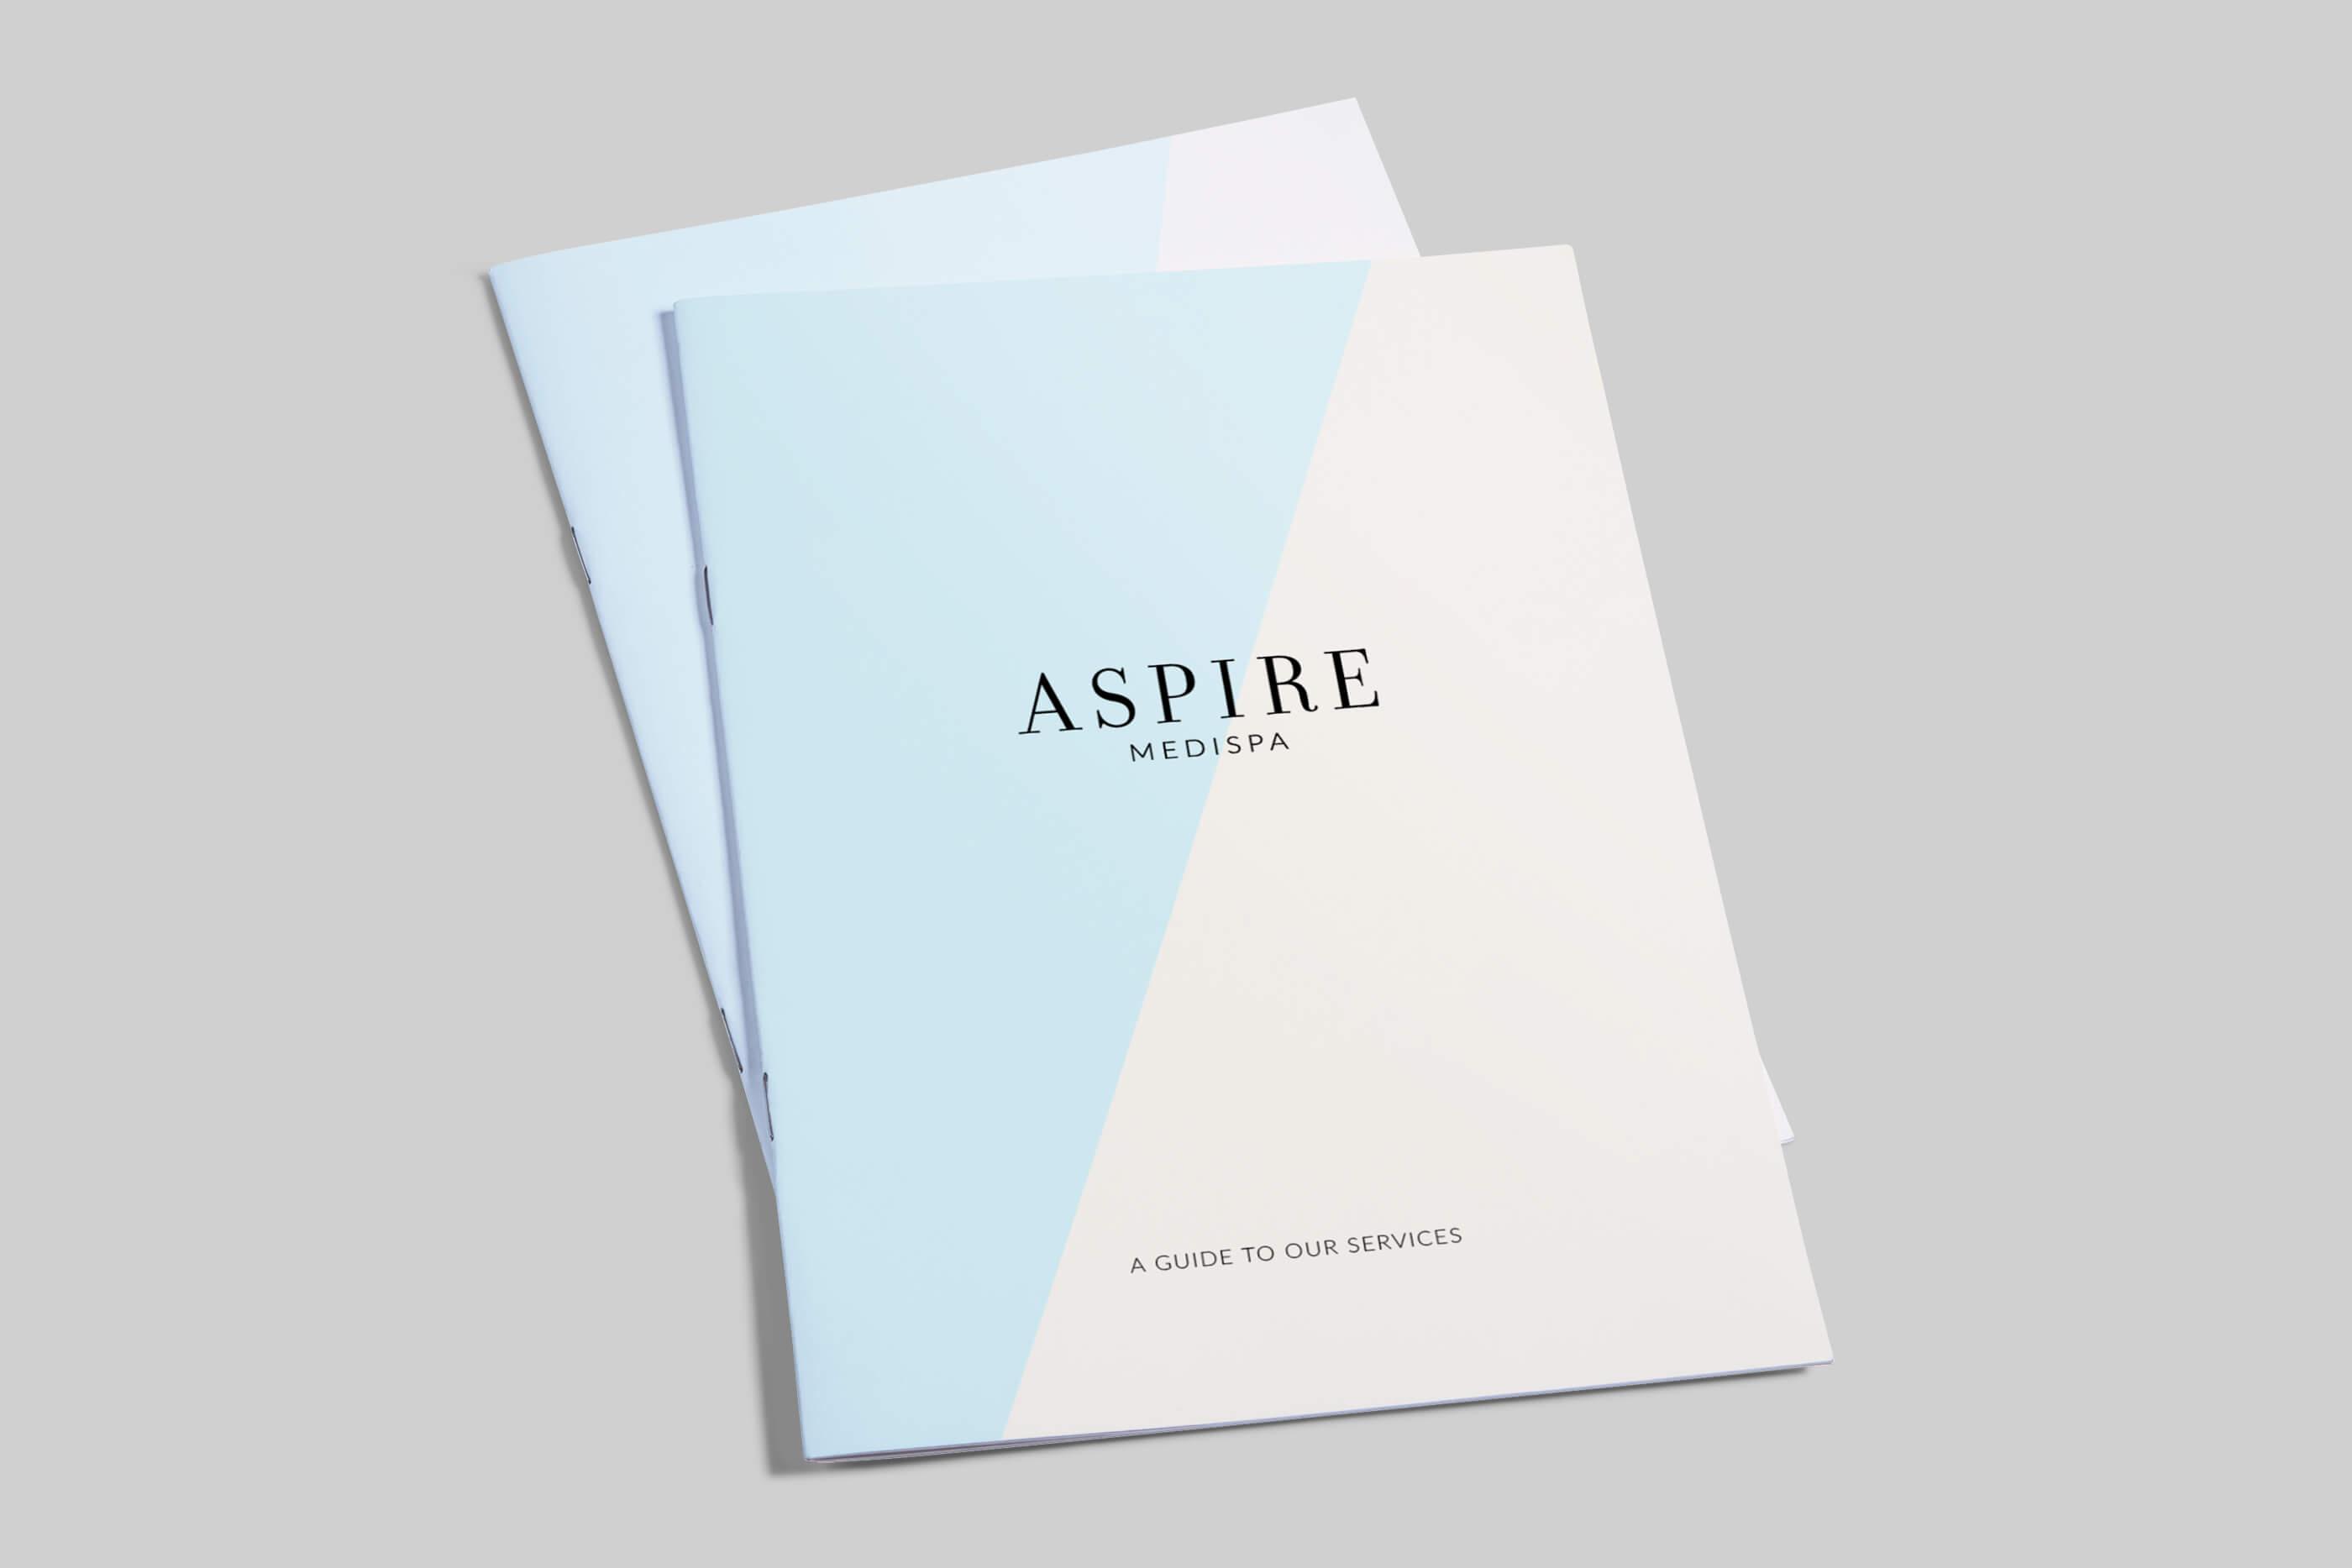 aspire-medispa-guide